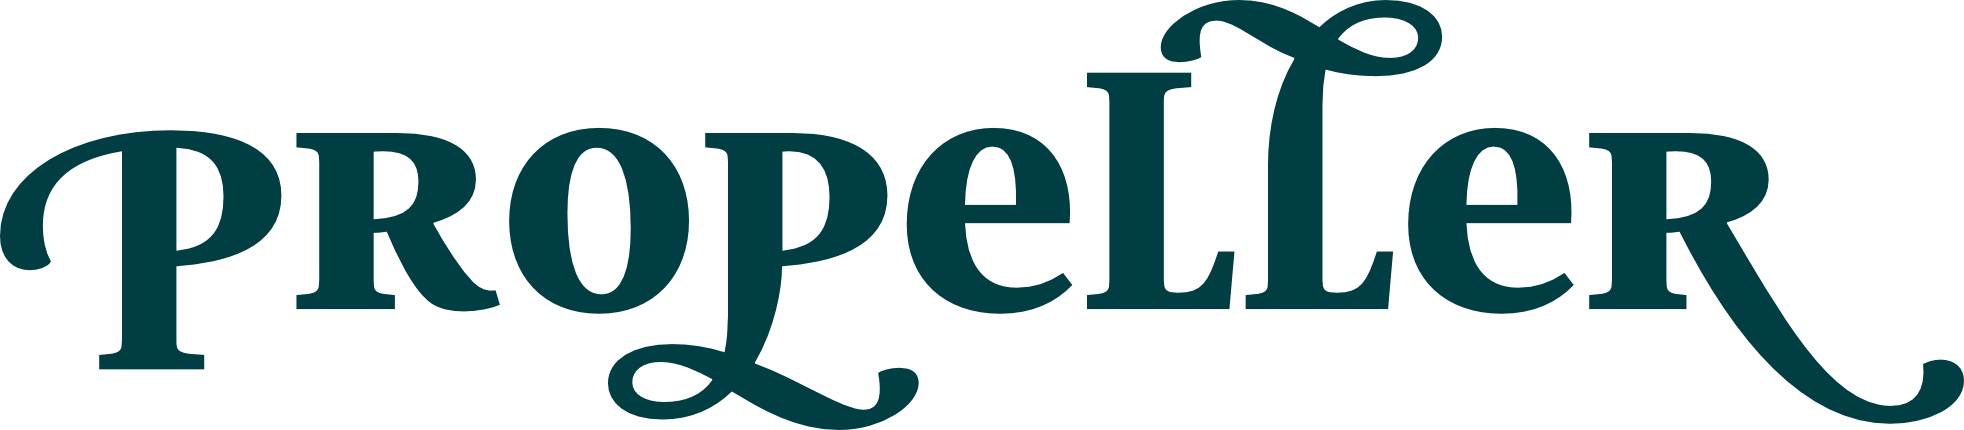 Image-Propeller